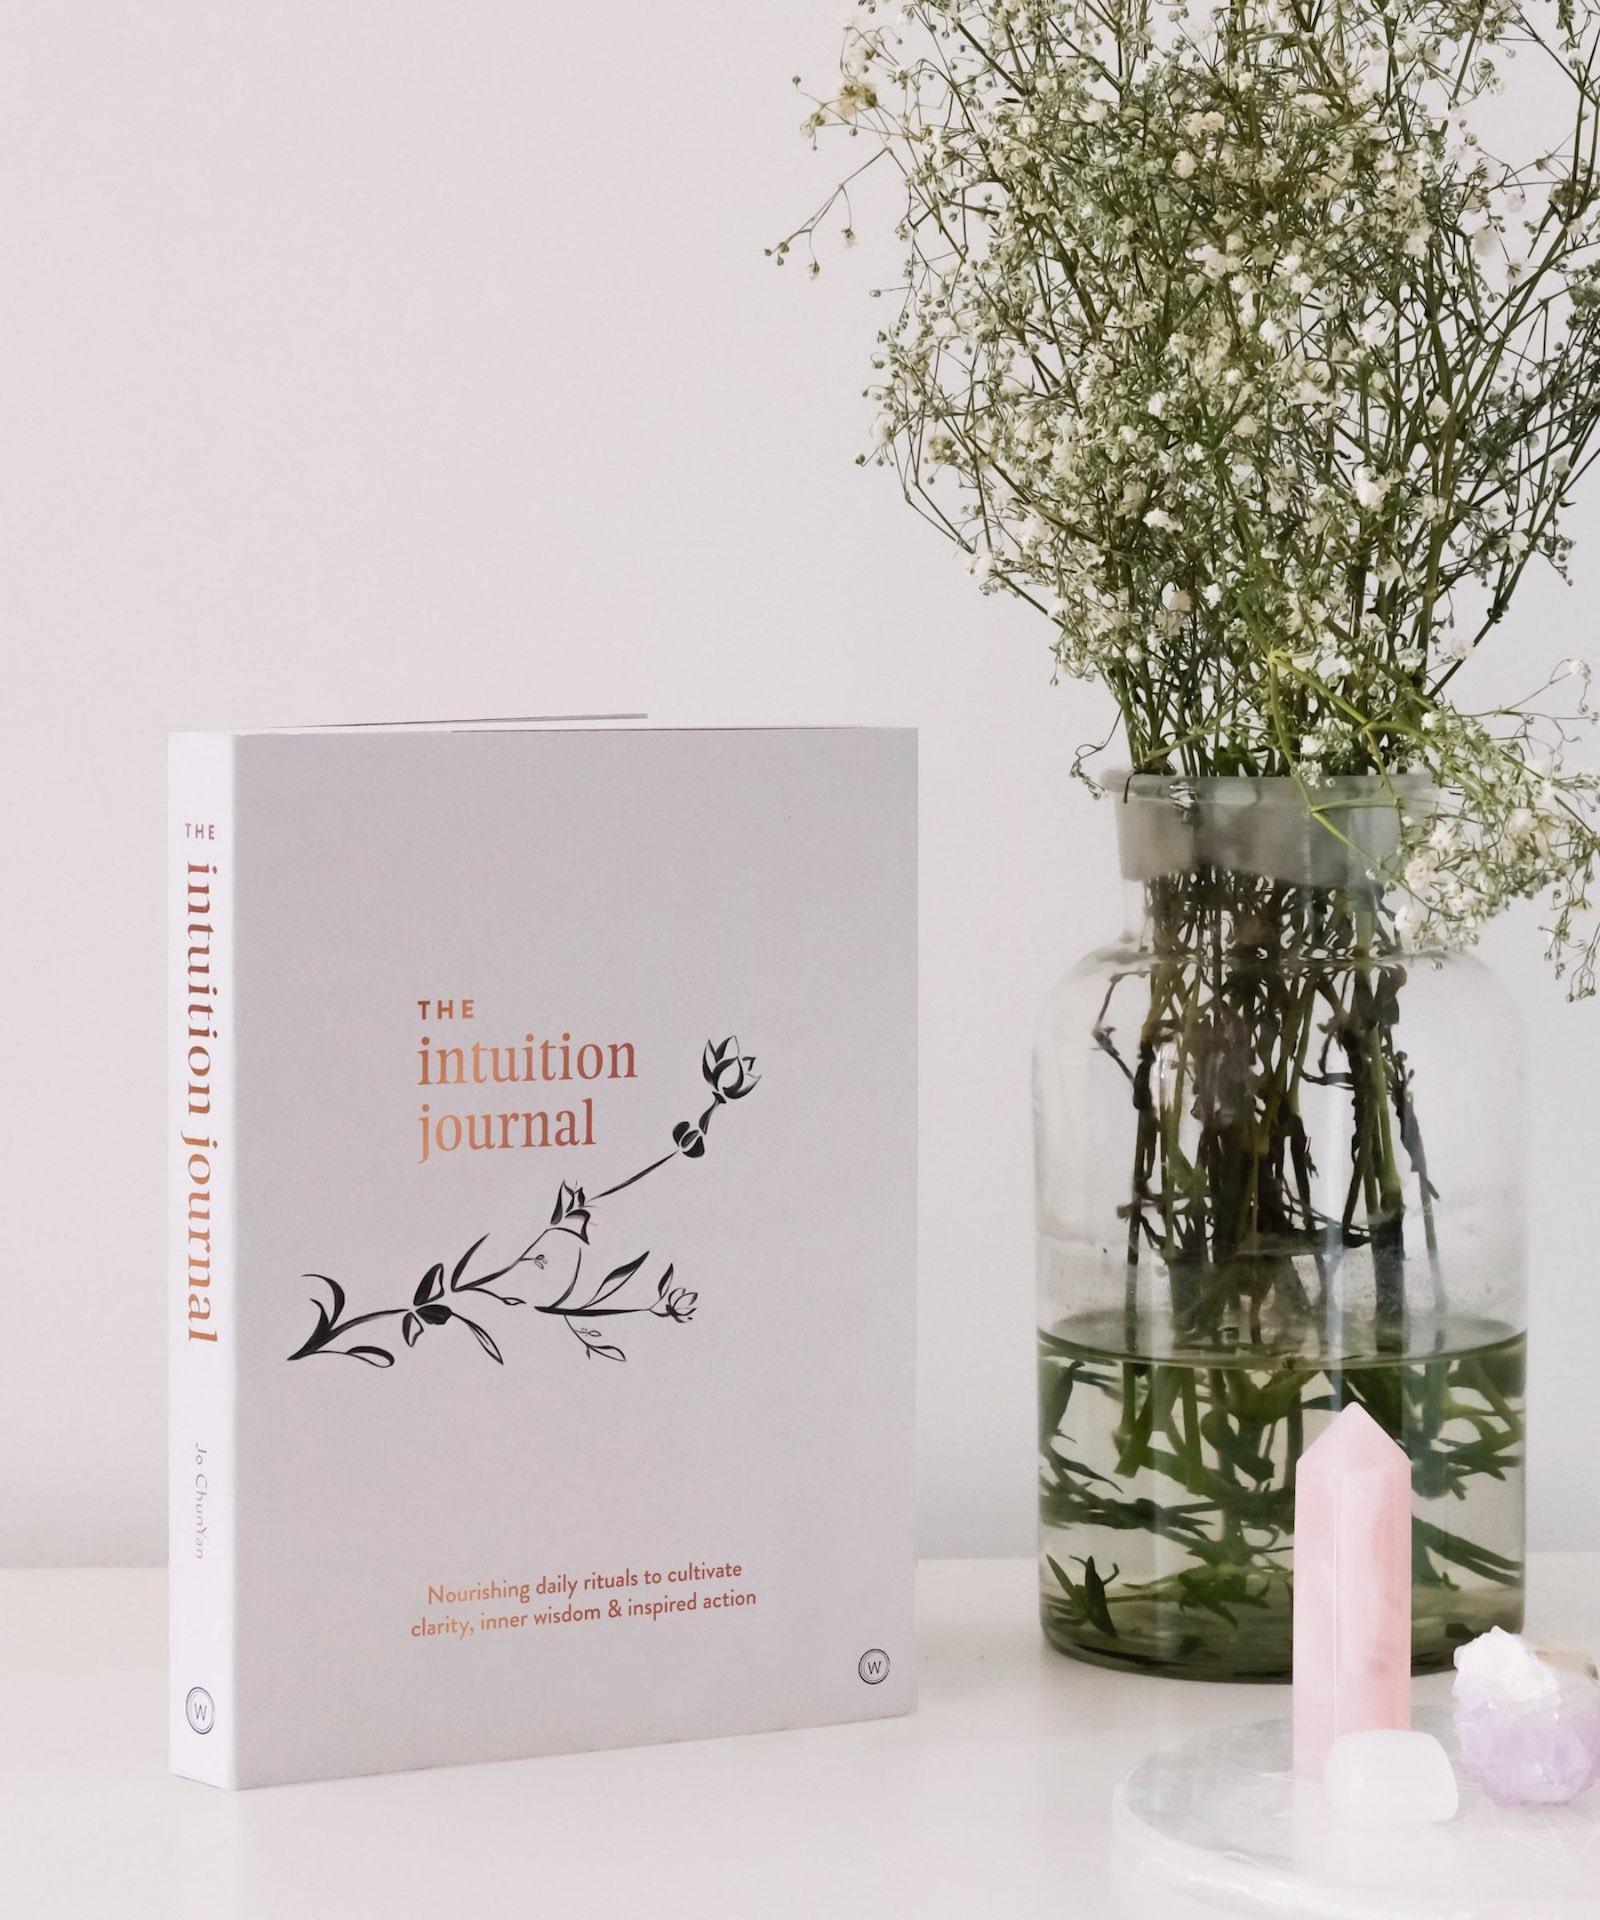 Jo-ChunYan_Intuition-Journal-image